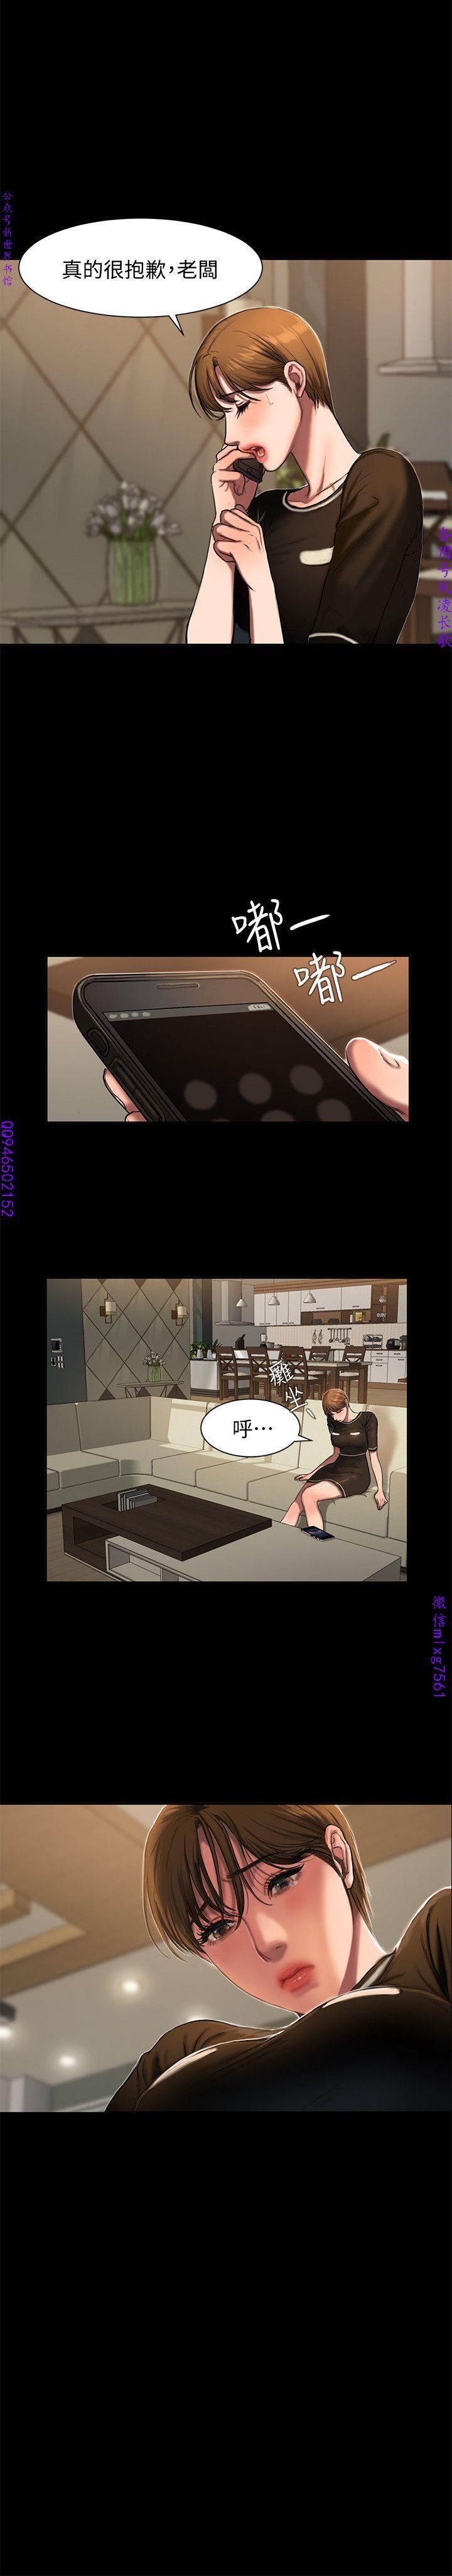 Run away 1-10【中文】 12